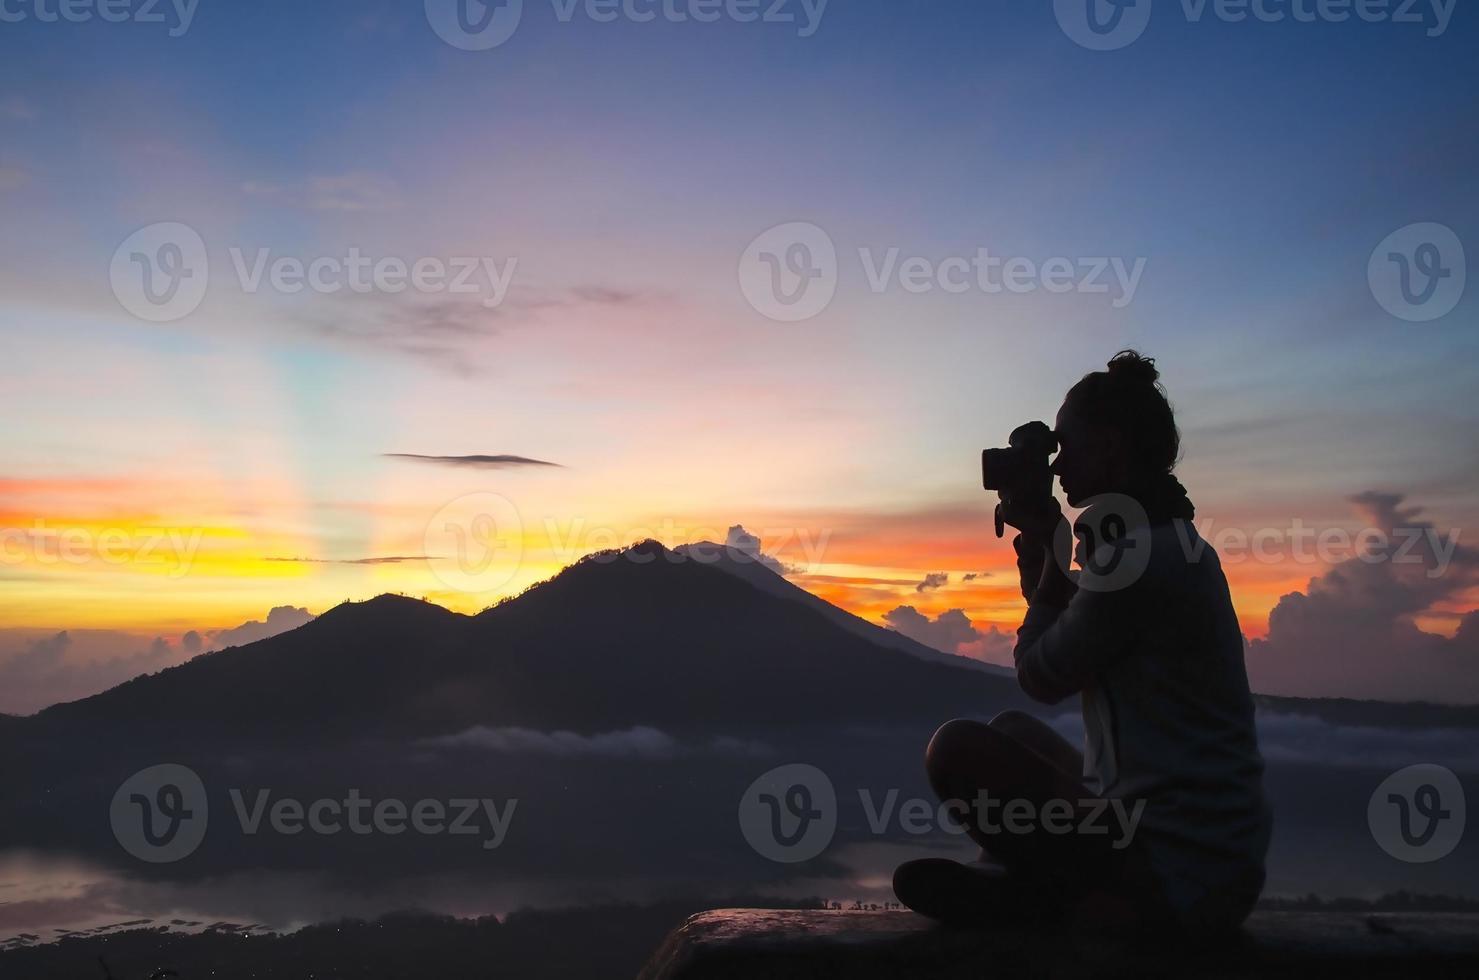 mulher fotógrafa - banco de imagens foto